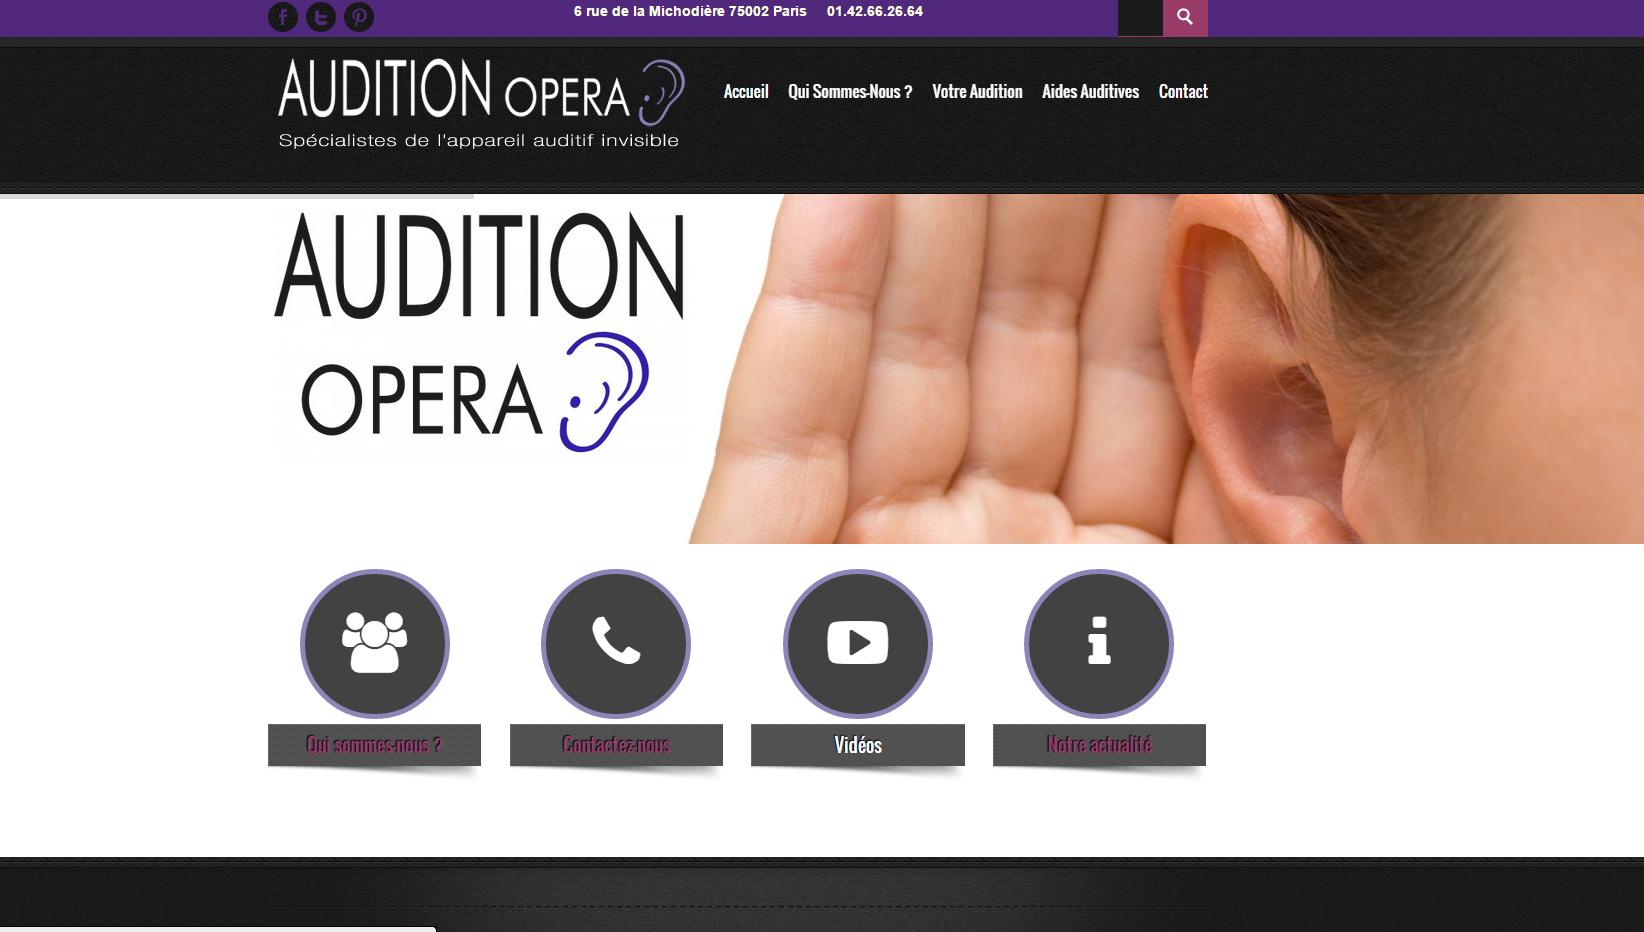 Audition Opera